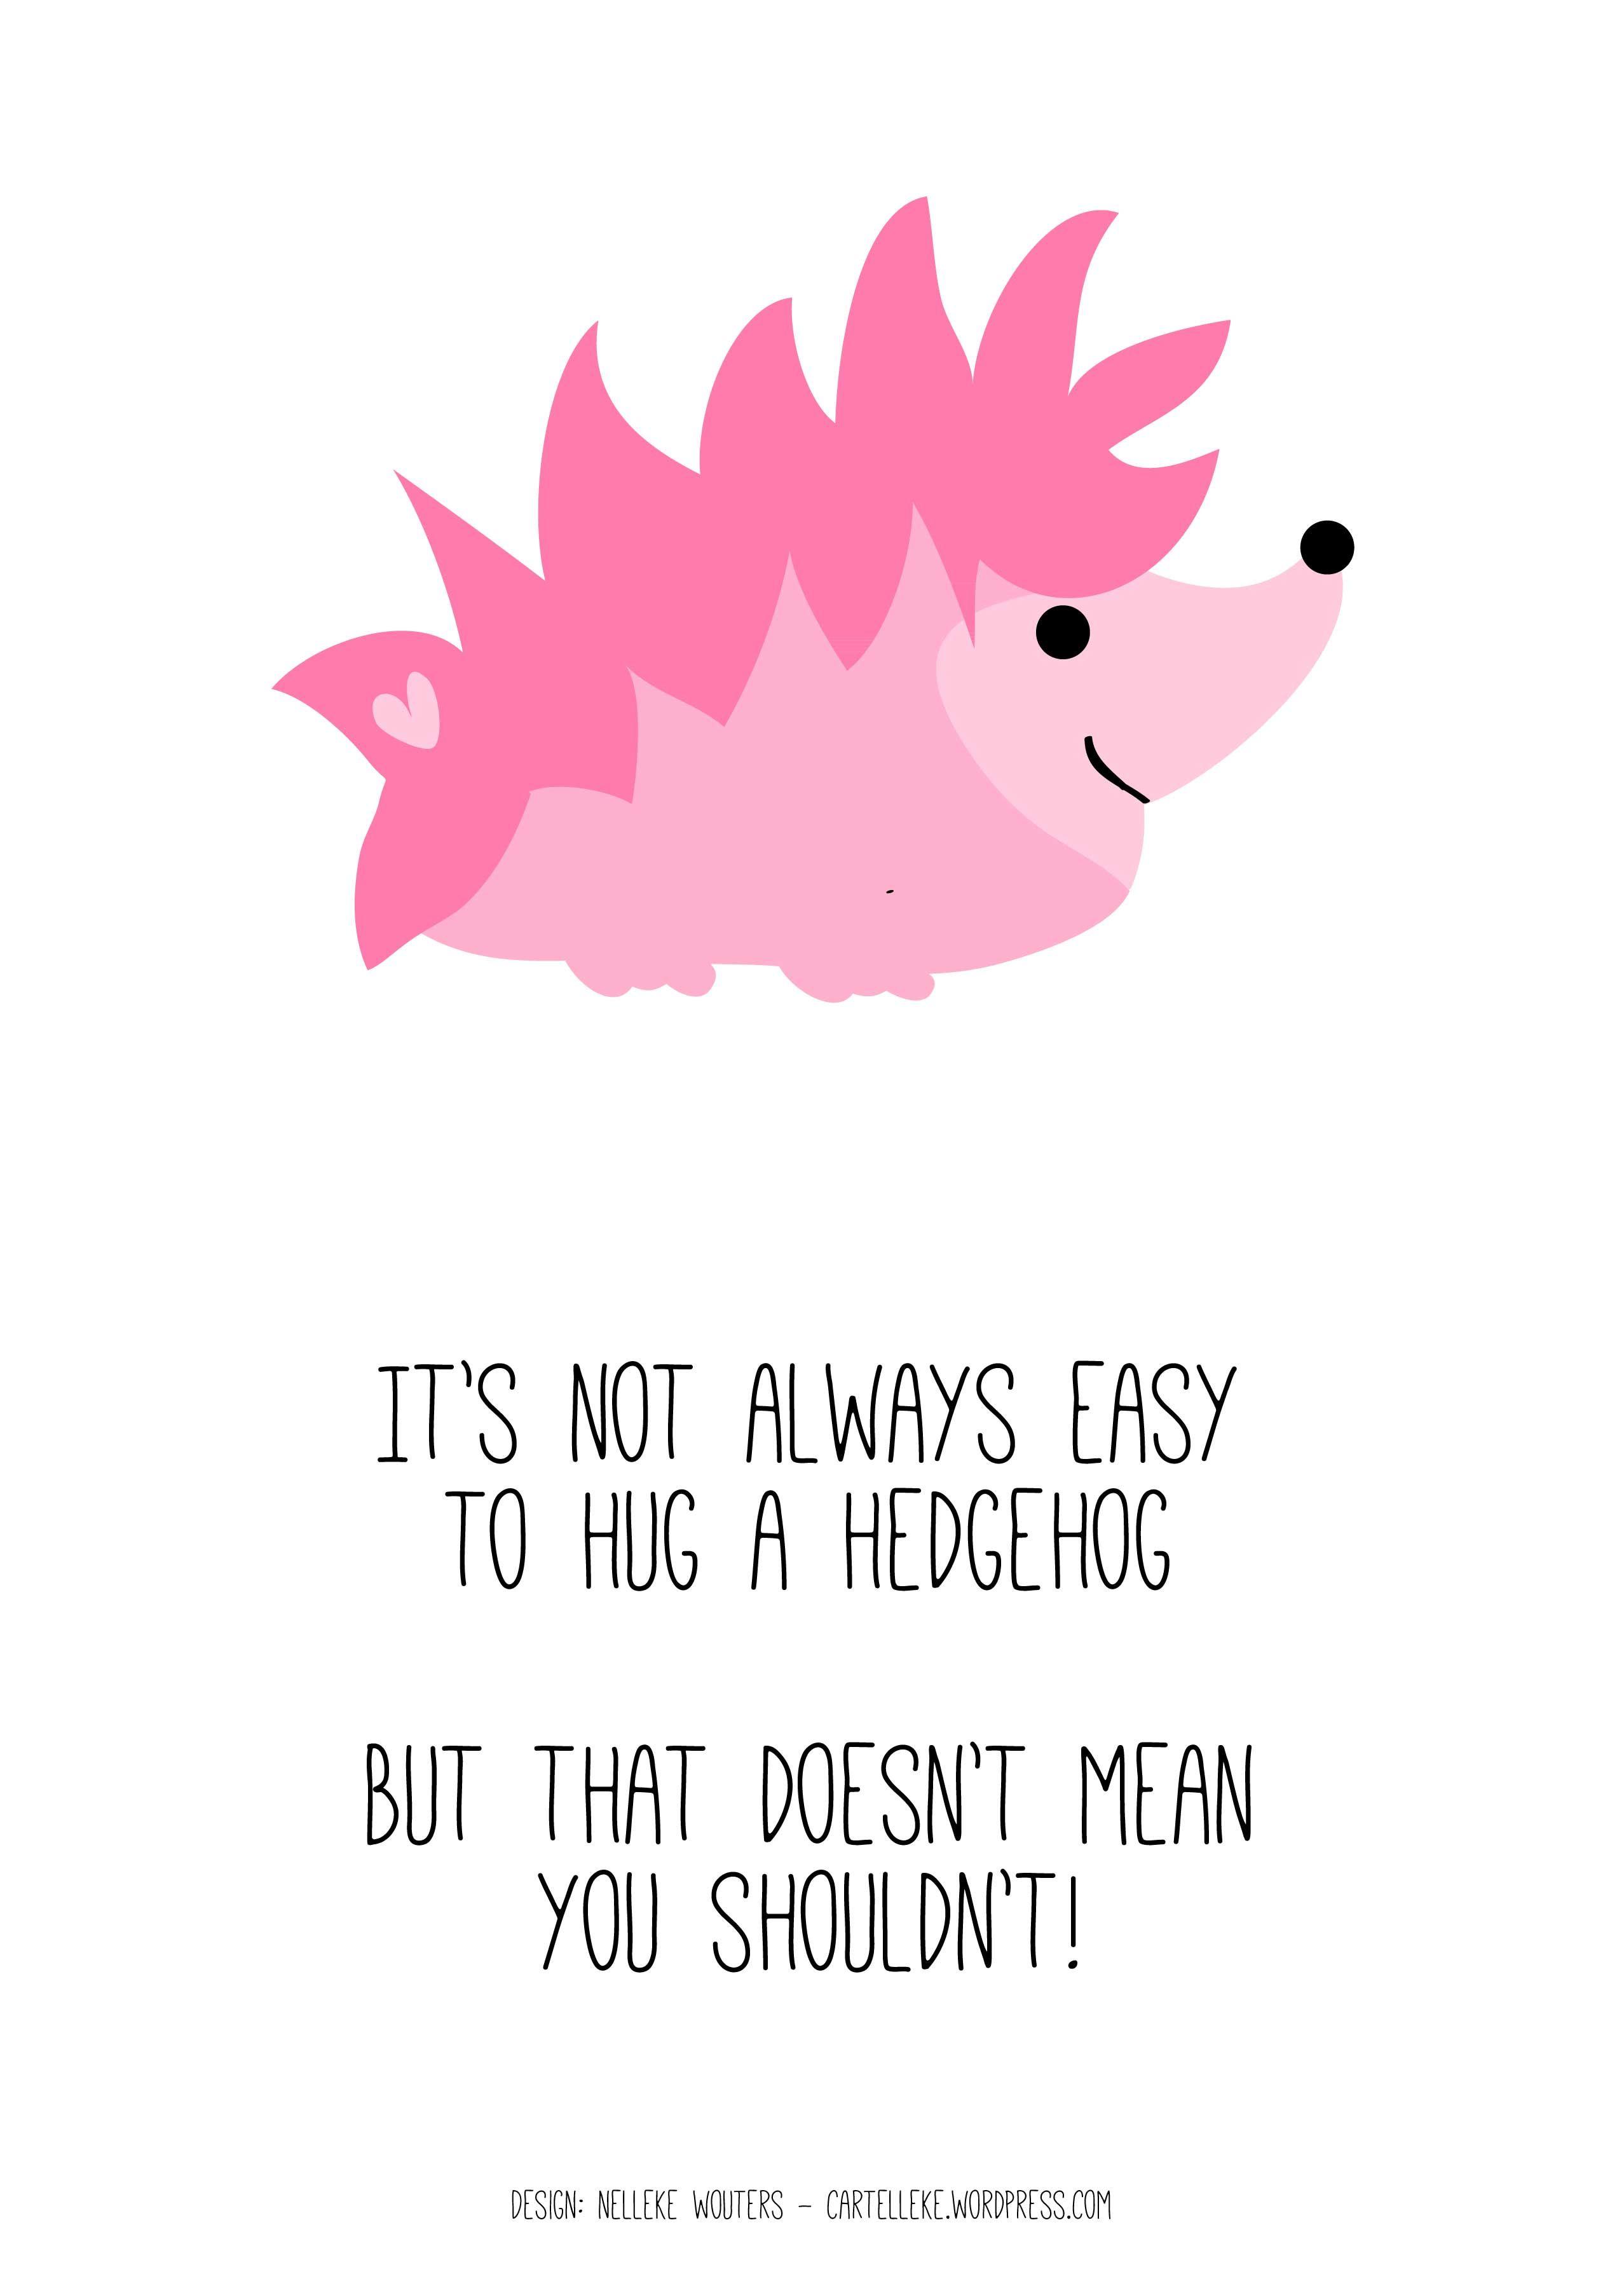 Hug A Hedgehog Love Quote Nelleke Wouters Cartelleke